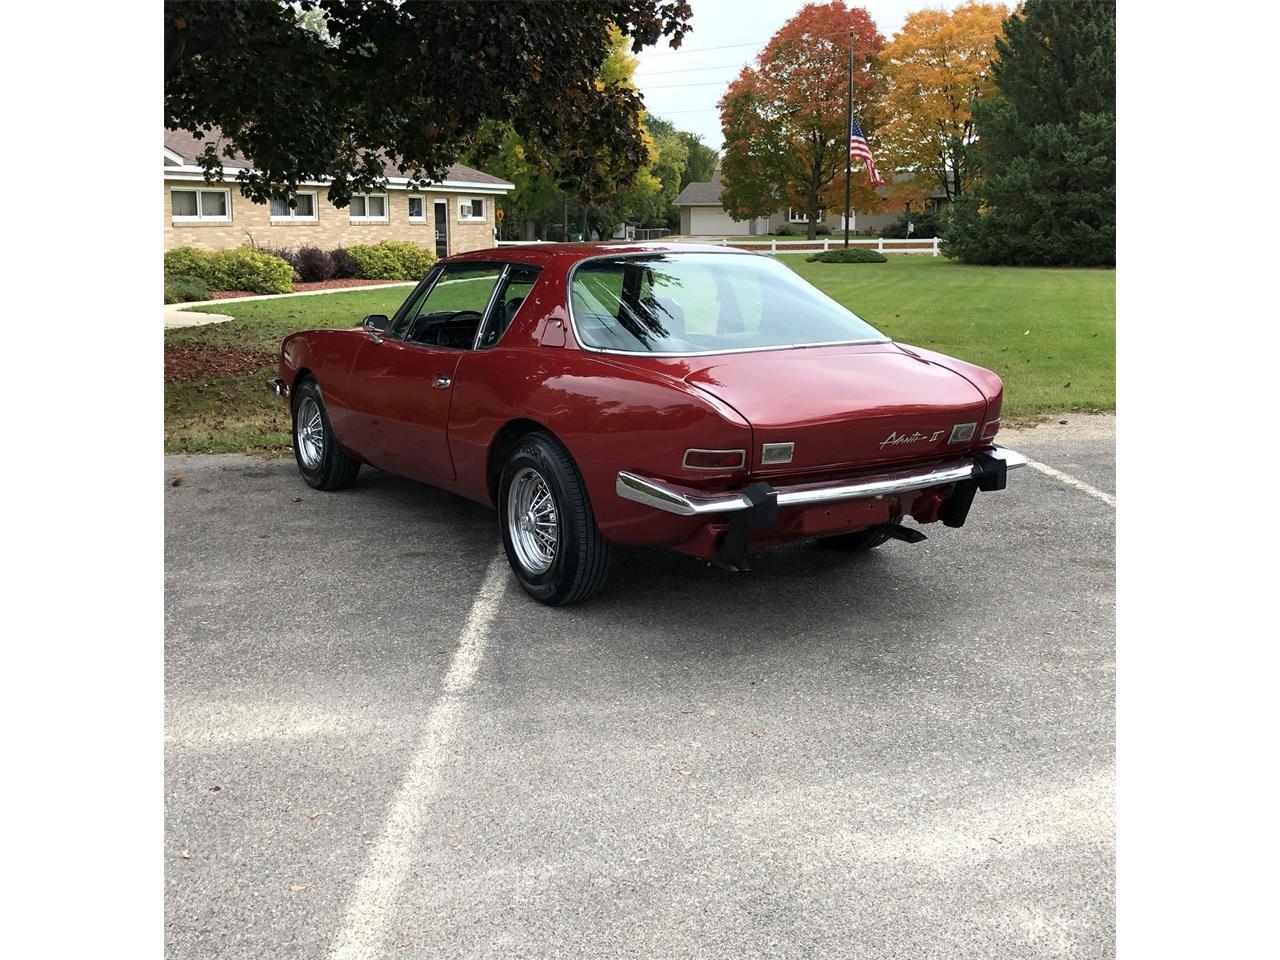 1974 Avanti Avanti II (CC-1394243) for sale in Maple Lake, Minnesota